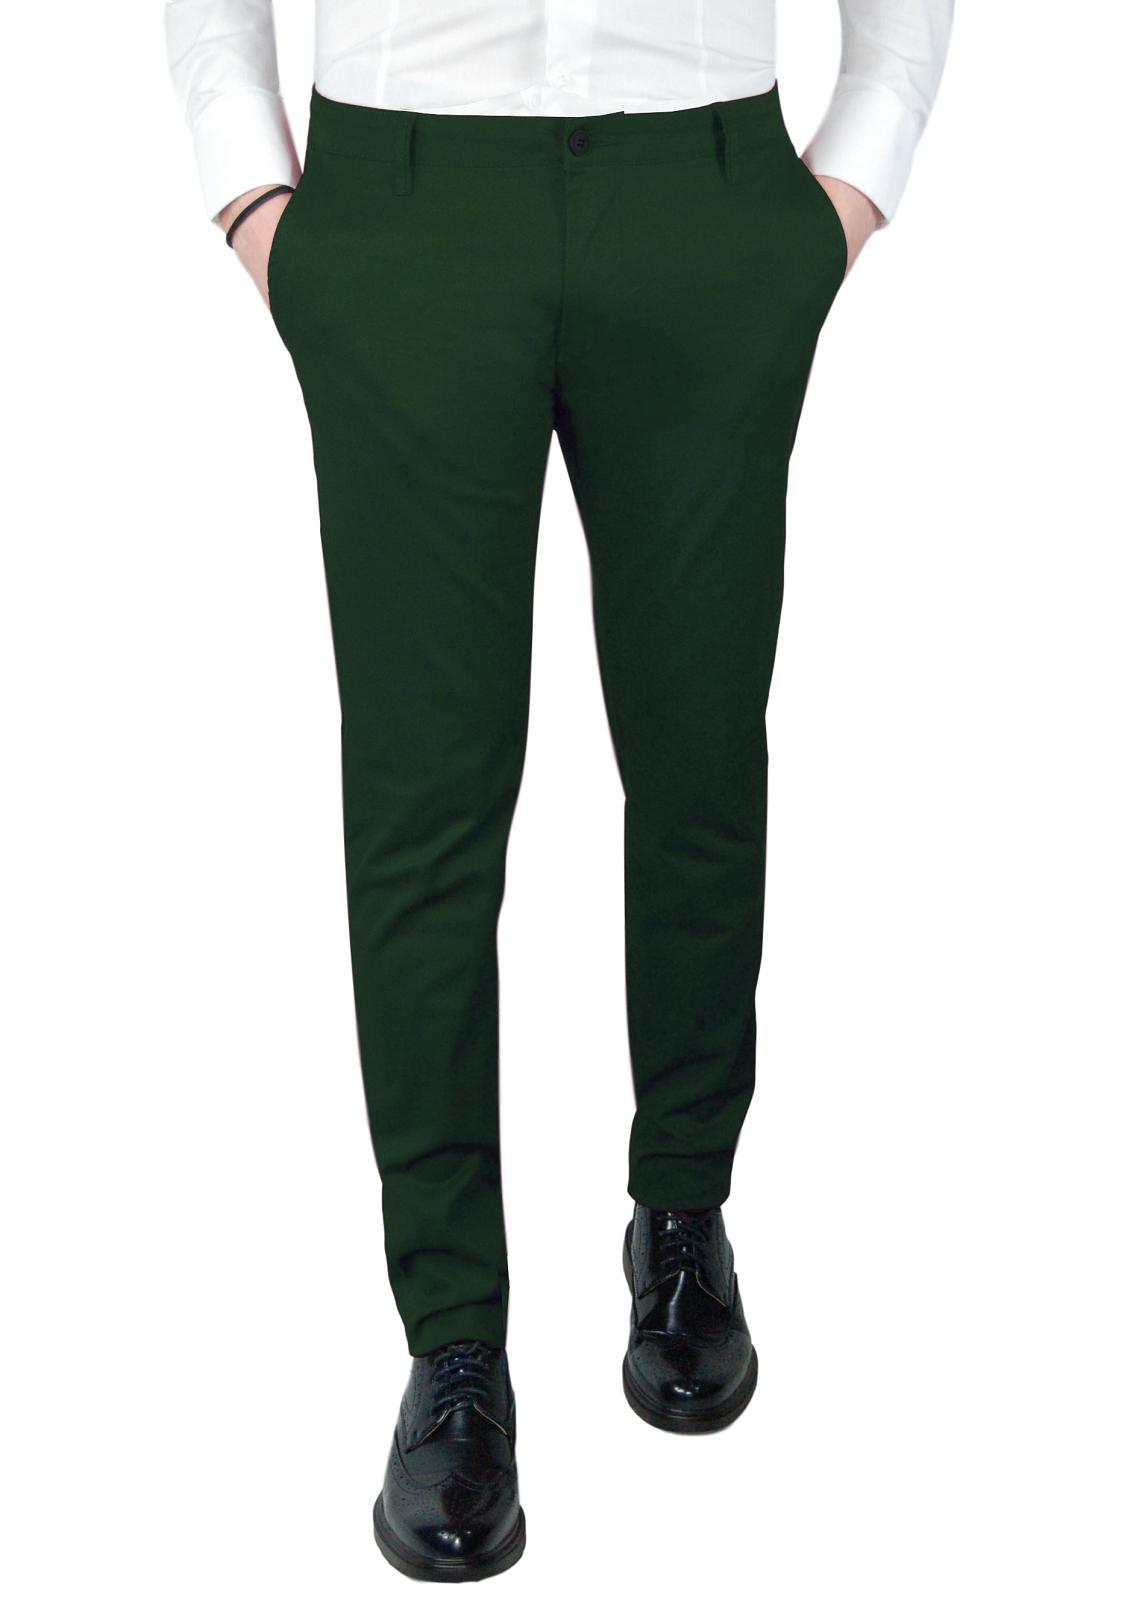 Pantalone-Uomo-Primaverile-Slim-Fit-Chino-tasca-america-Cotone-Blu-Nero-Verde miniatura 22